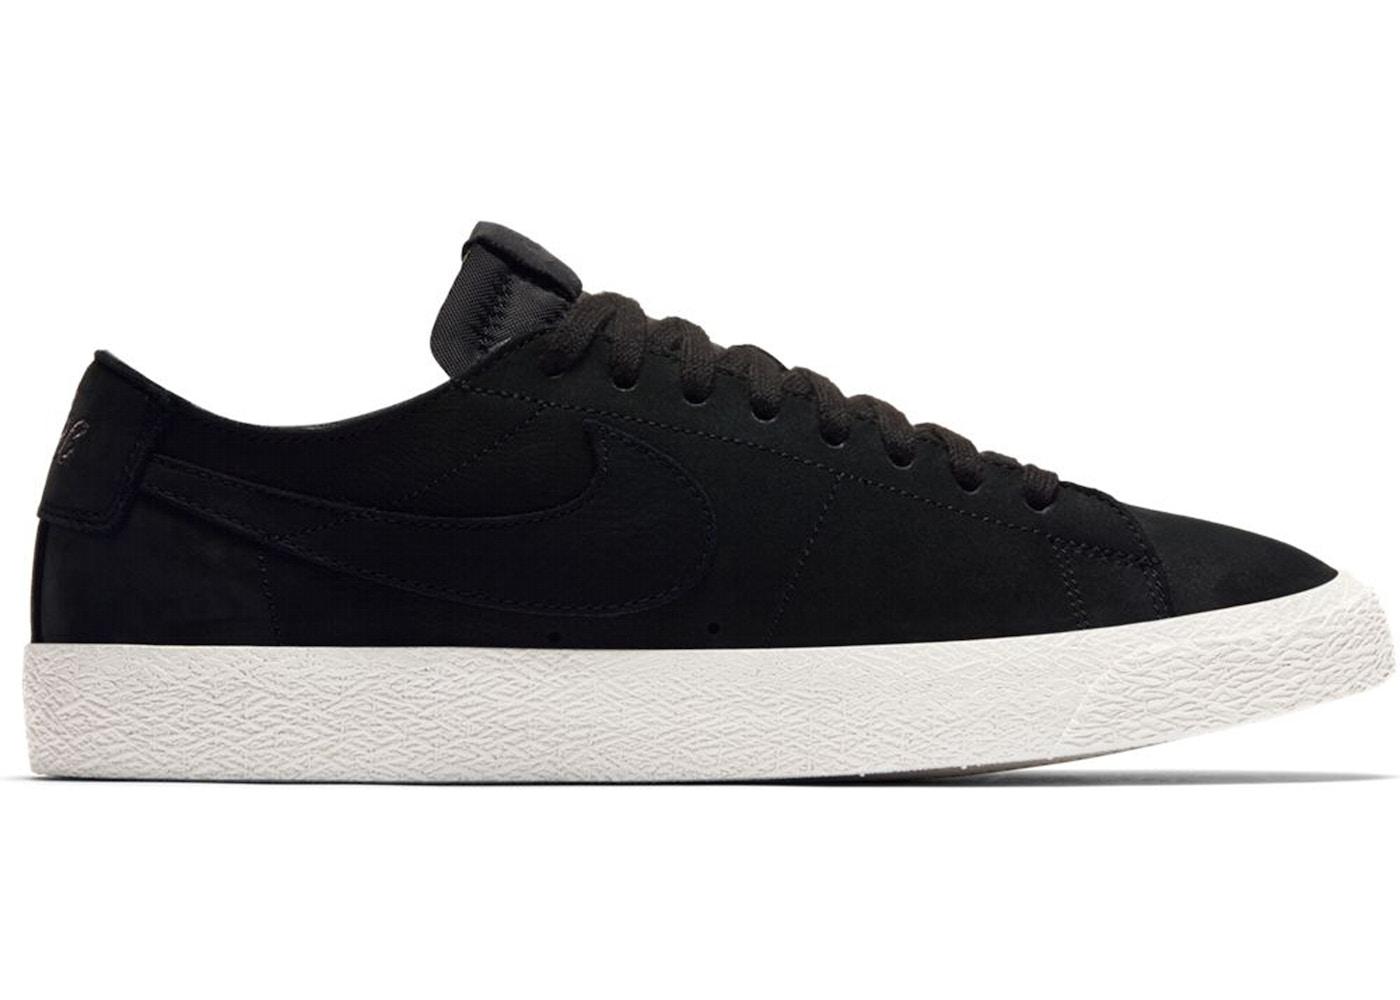 the latest 9dc20 37f10 Nike SB Zoom Blazer Low Decon Black Anthracite